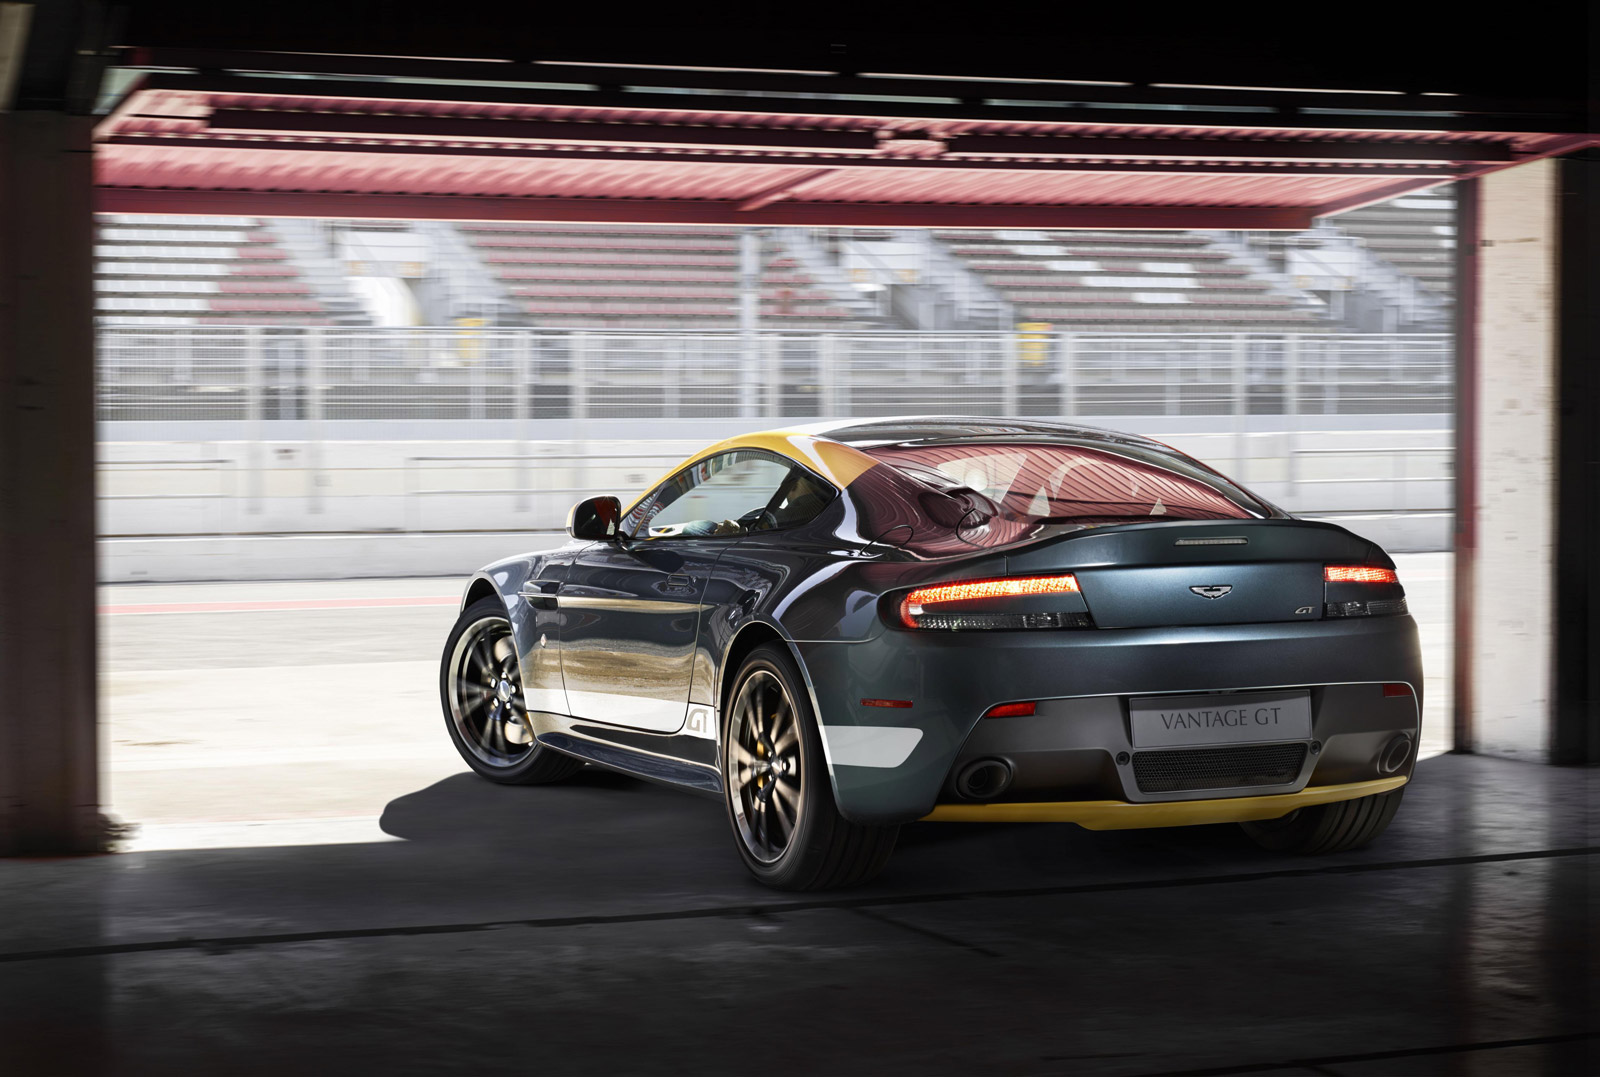 2015 aston martin vantage gt to race in nürburgring 24 hours